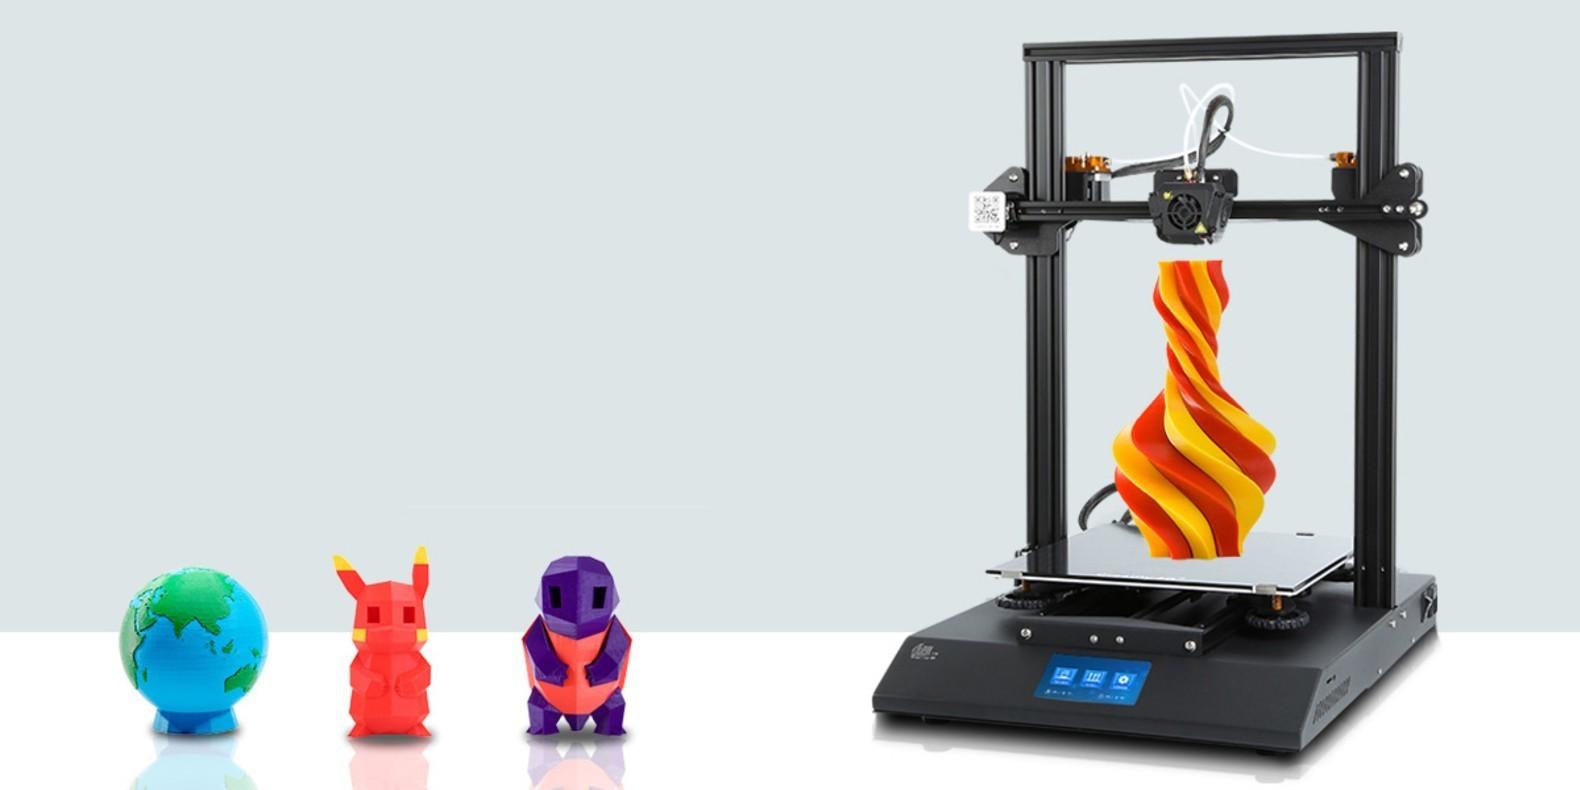 Reseñas de impresoras 3D : Creality3D CR10, Creality3D CR ENDRE 3 y Creality3D CR10S.